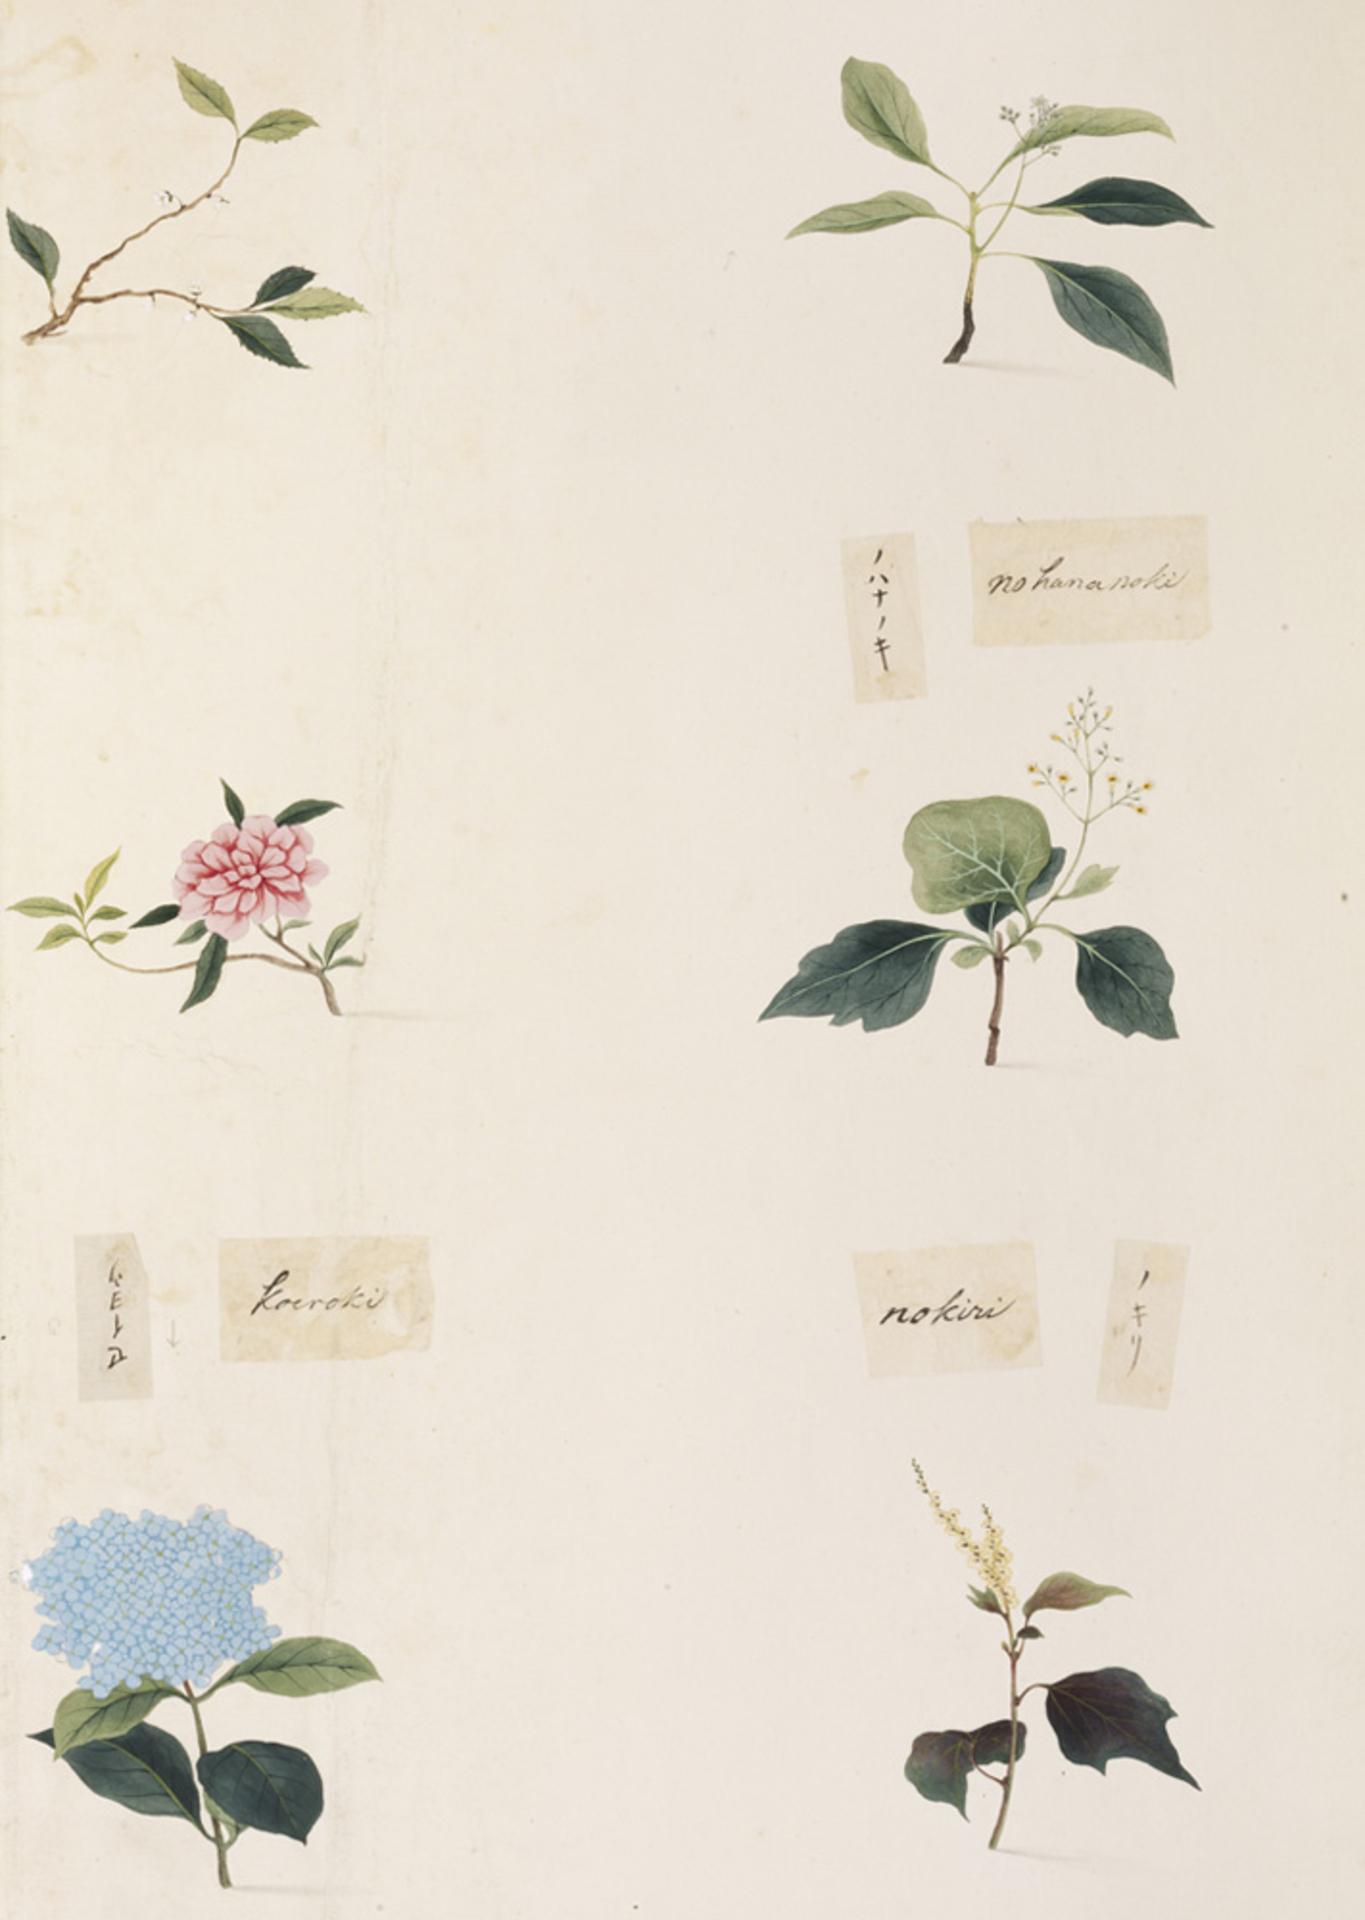 RMNH.ART.355 | Mallotus japonicus